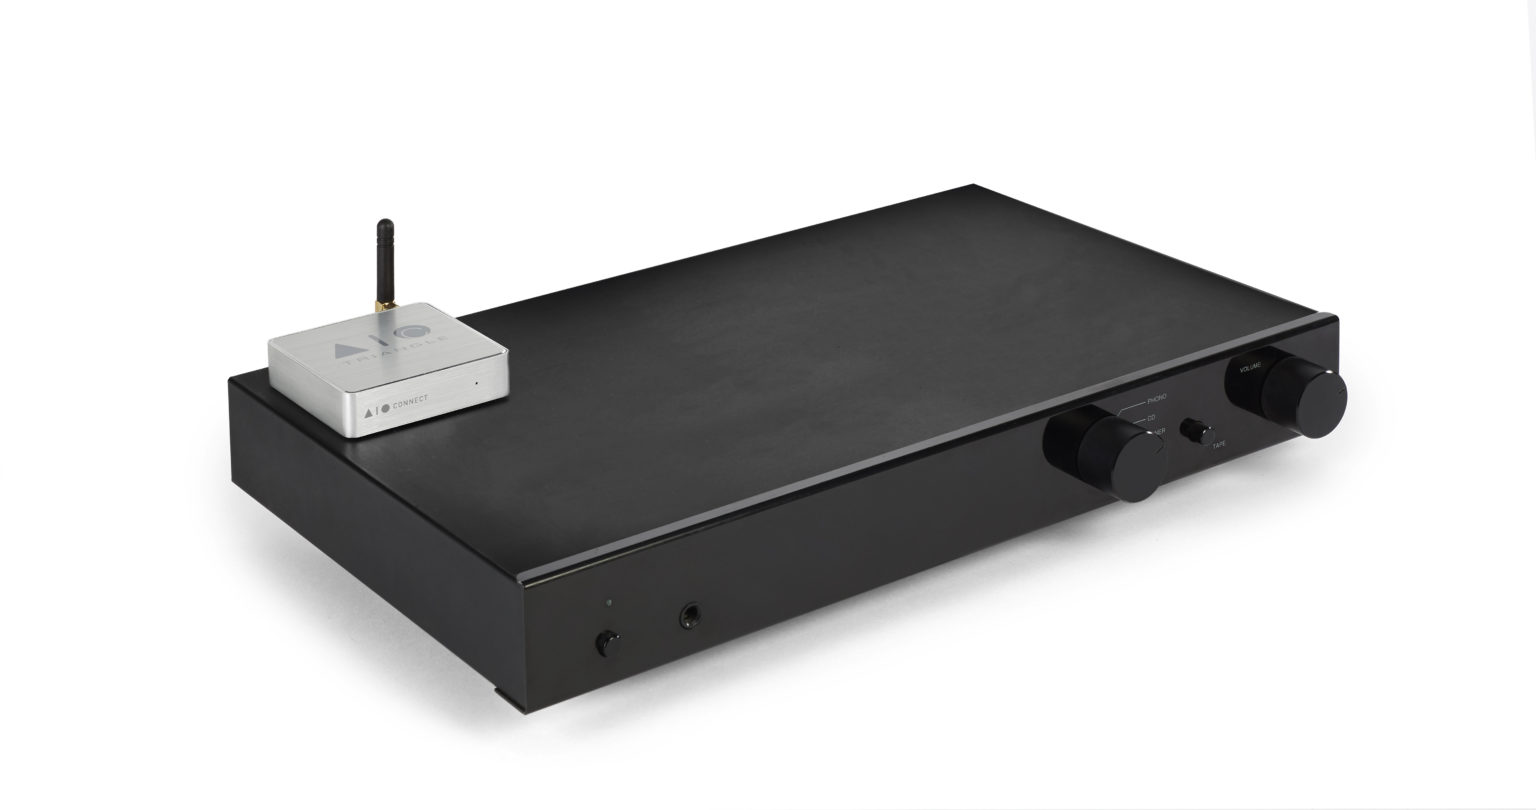 Système Enceinte connectée bluetooth wifi hifi triangle AIOC packshot 07